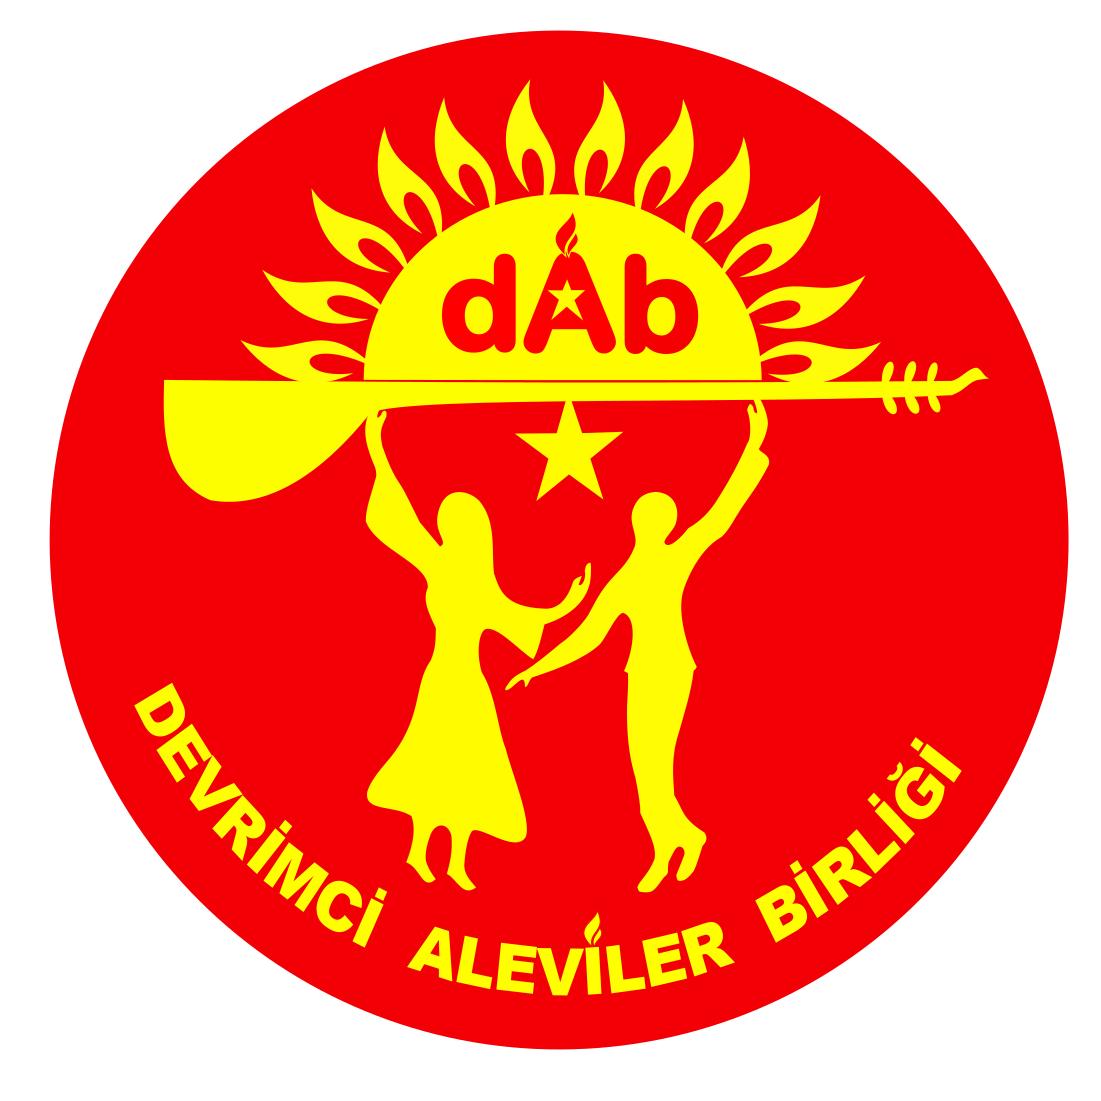 Devrimci Aleviler Birliği DAB Alevi Kızılbaş Bektaşi pir sultan cem hz Ali 12 imam semah Feramuz Şah Acar DABLOGOPNG2